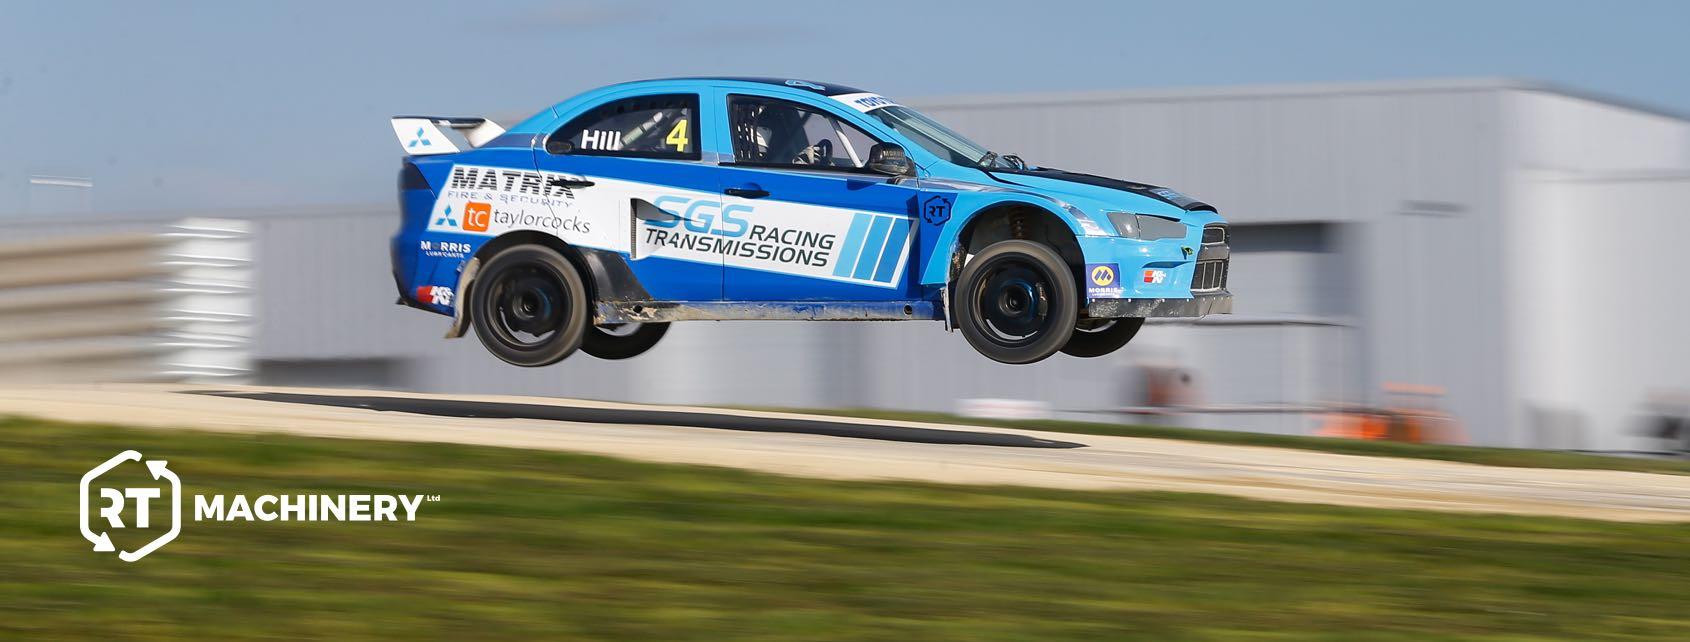 steve-hill-rallycross-banner